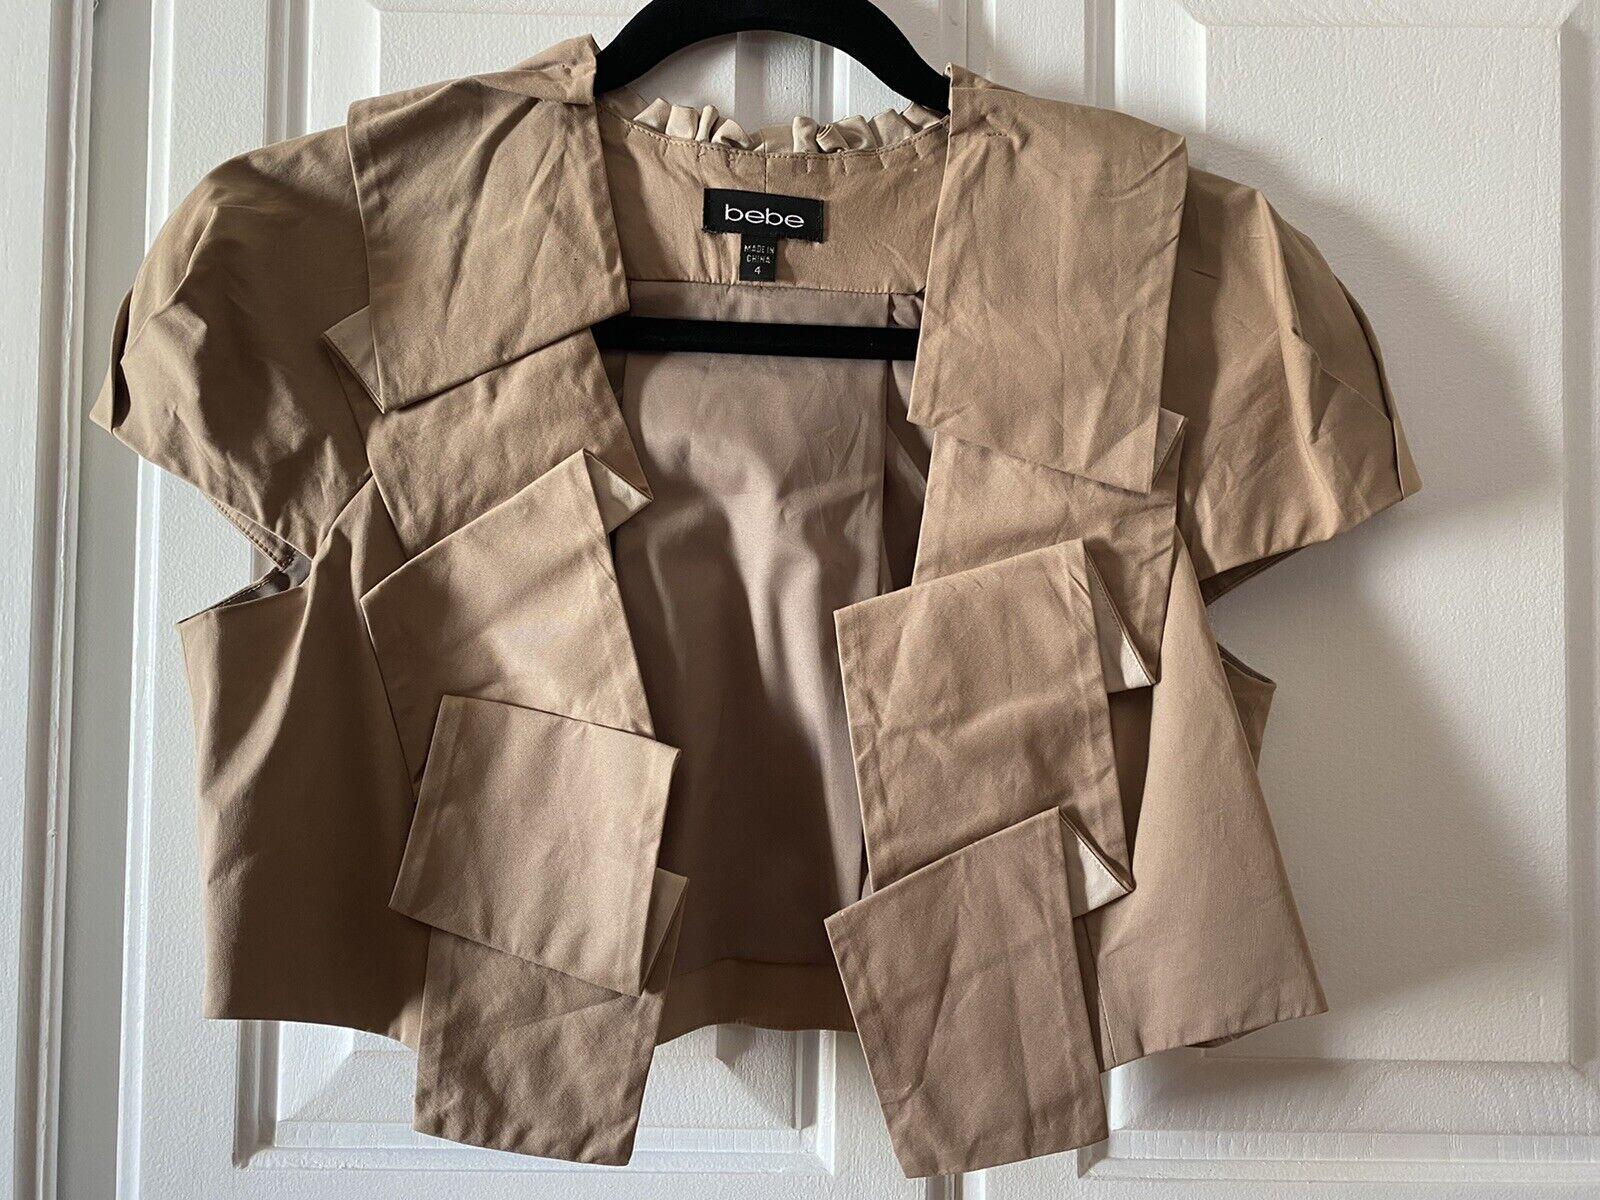 bebe Short Sleeve Cotton Jacket Top Dressy Short Crop Size 4